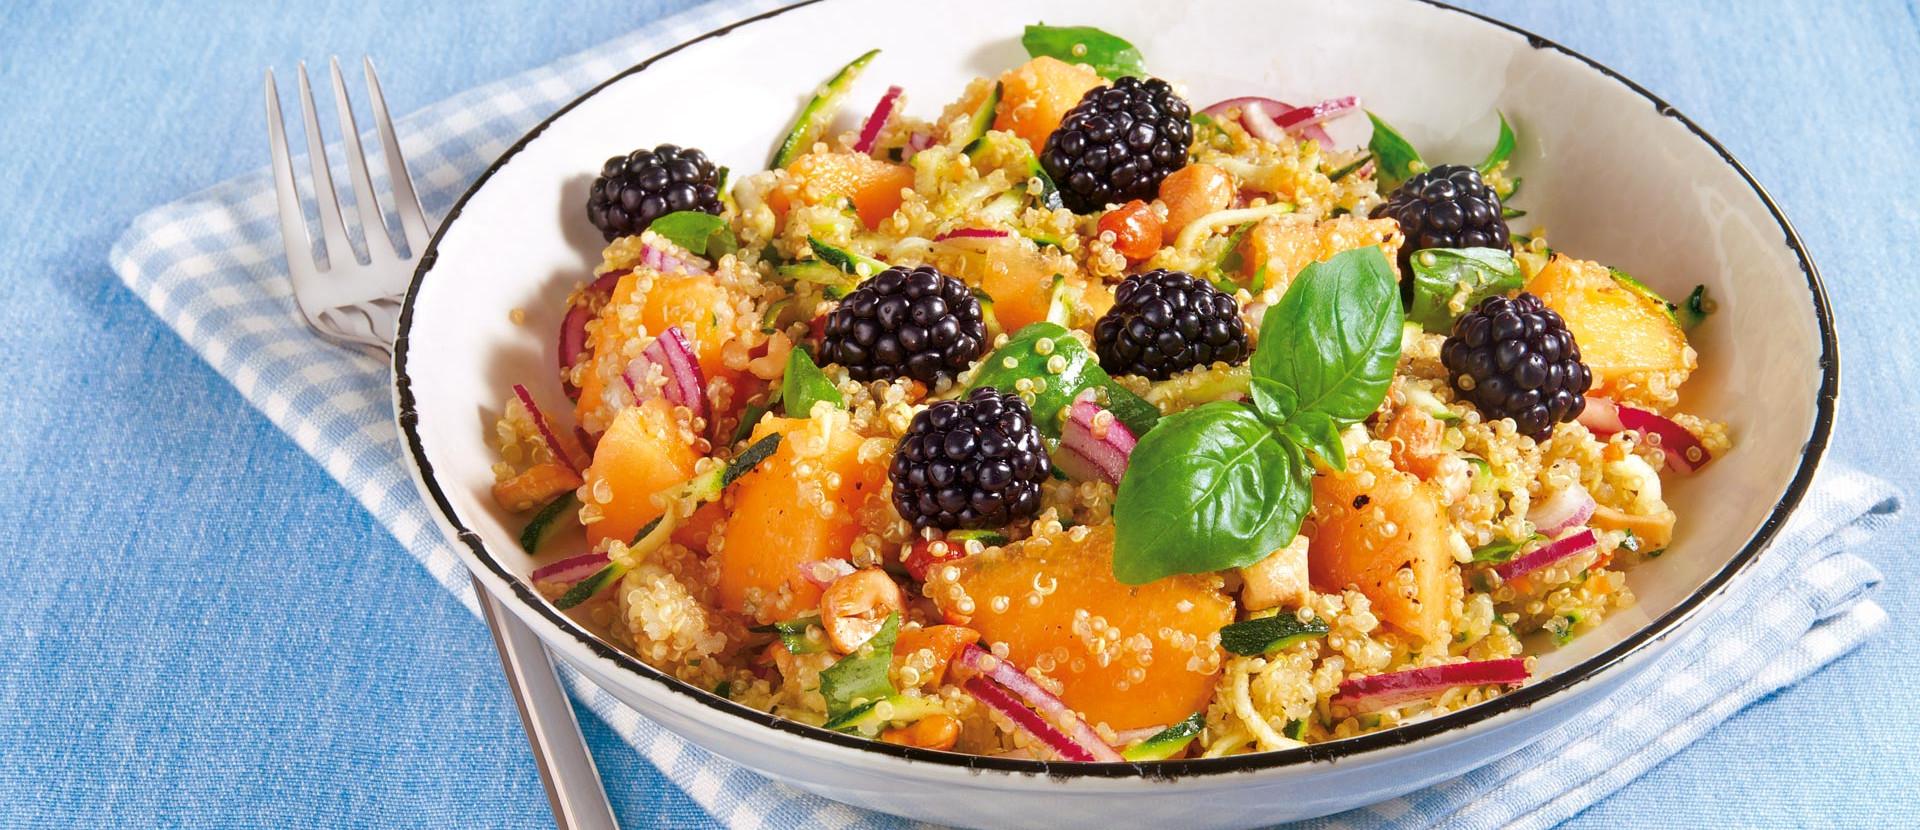 MelonenQuinoa Salat mit Brombeeren